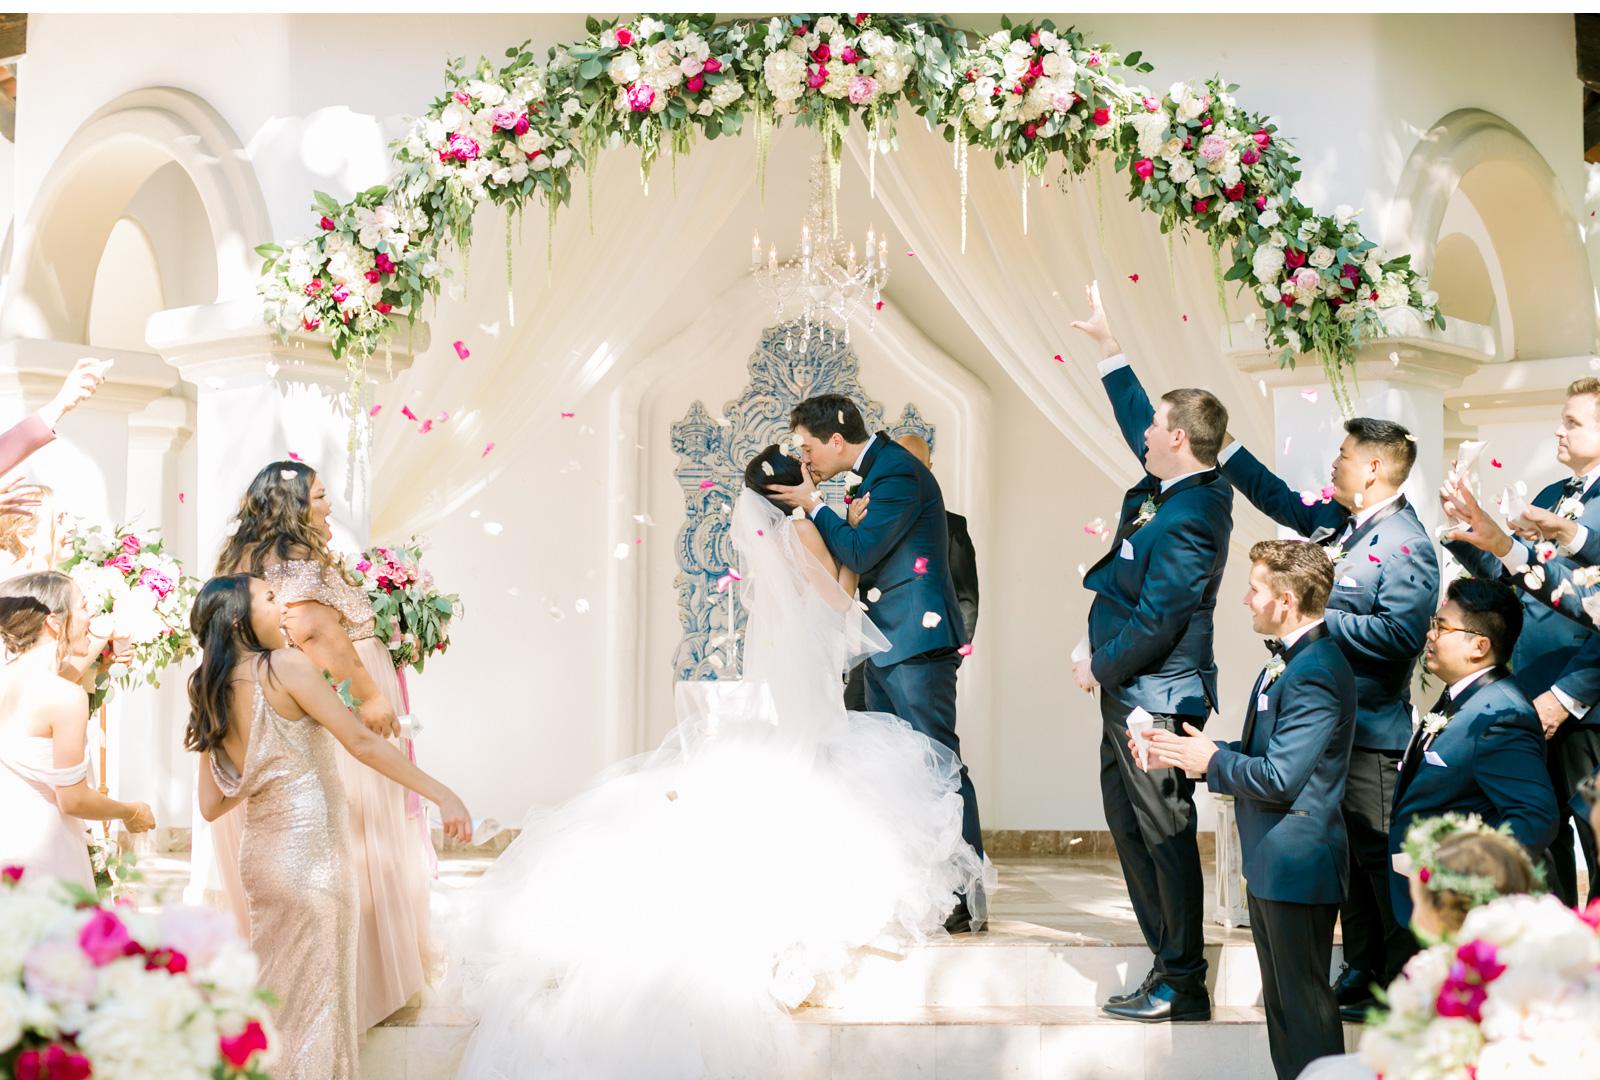 Malibu-Wedding-Triunfo-Creek-Natalie-Schutt-Photography_03.jpg